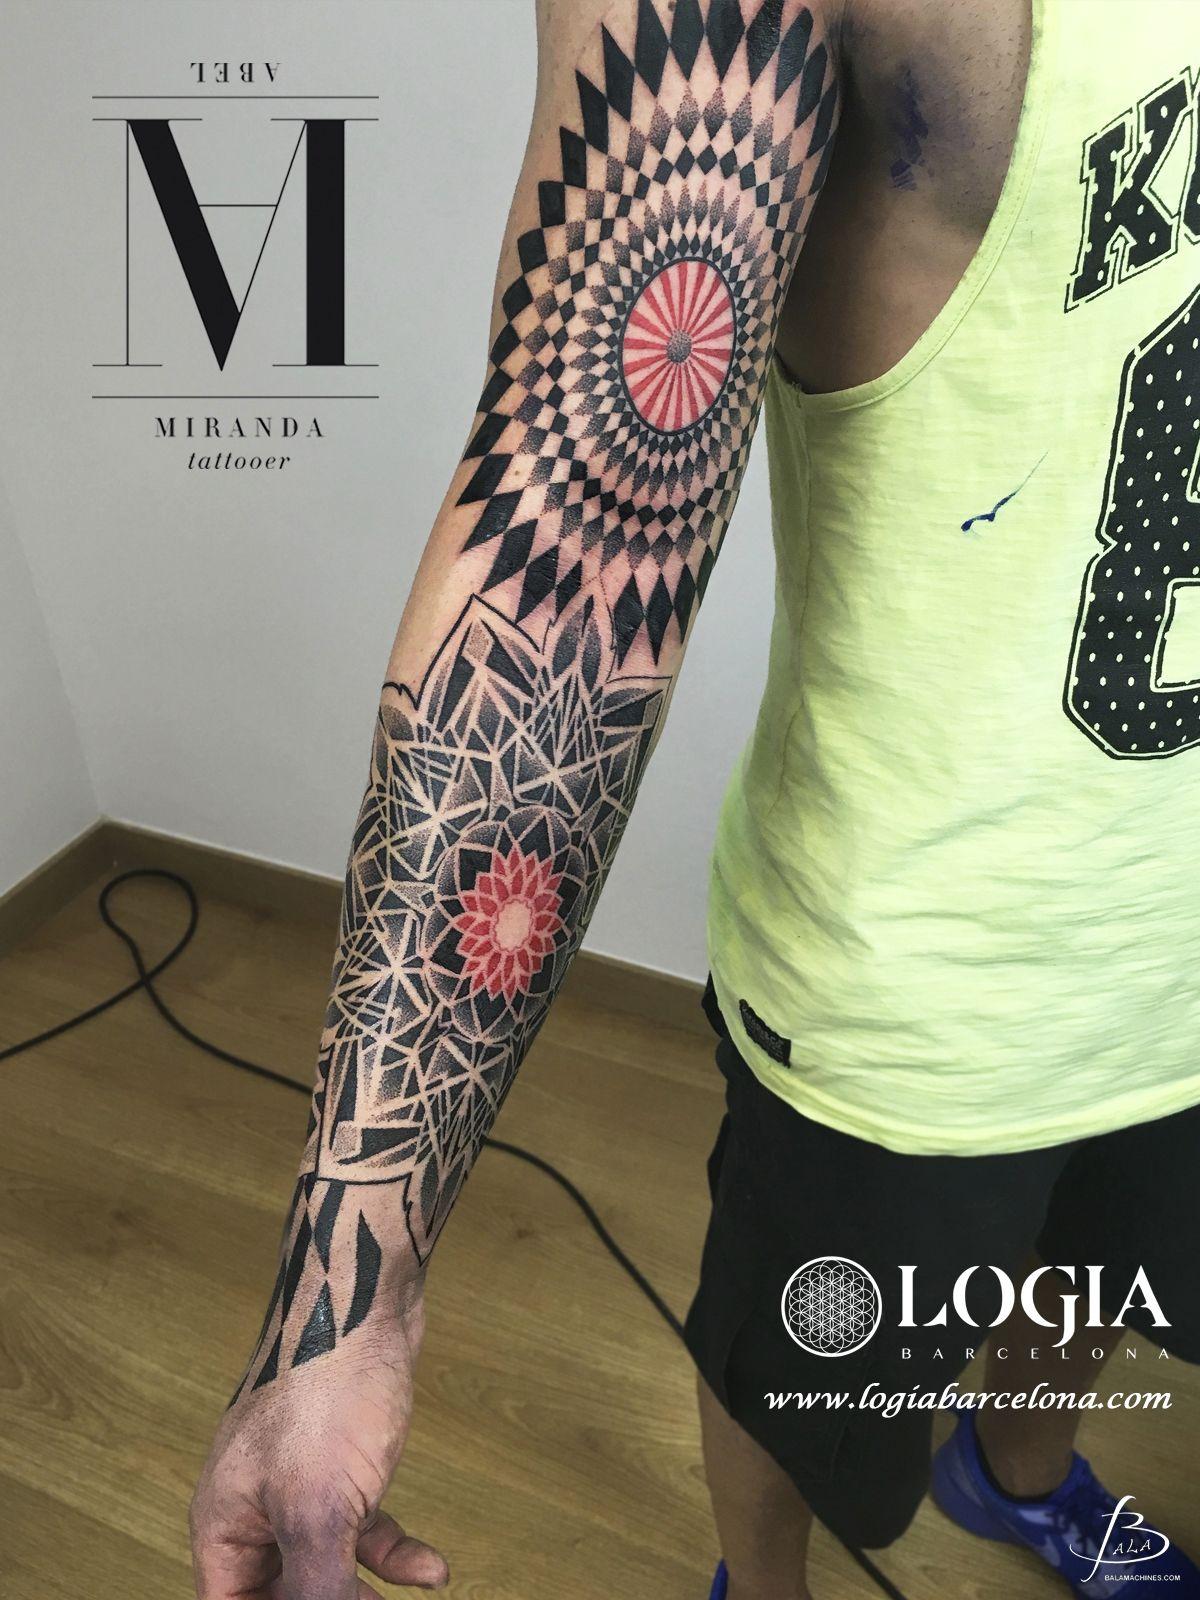 Pin de R y C Ram en Artistas del tatuaje | Tatuajes al azar, Blog de  tatuajes, Tatuajes impresionantes